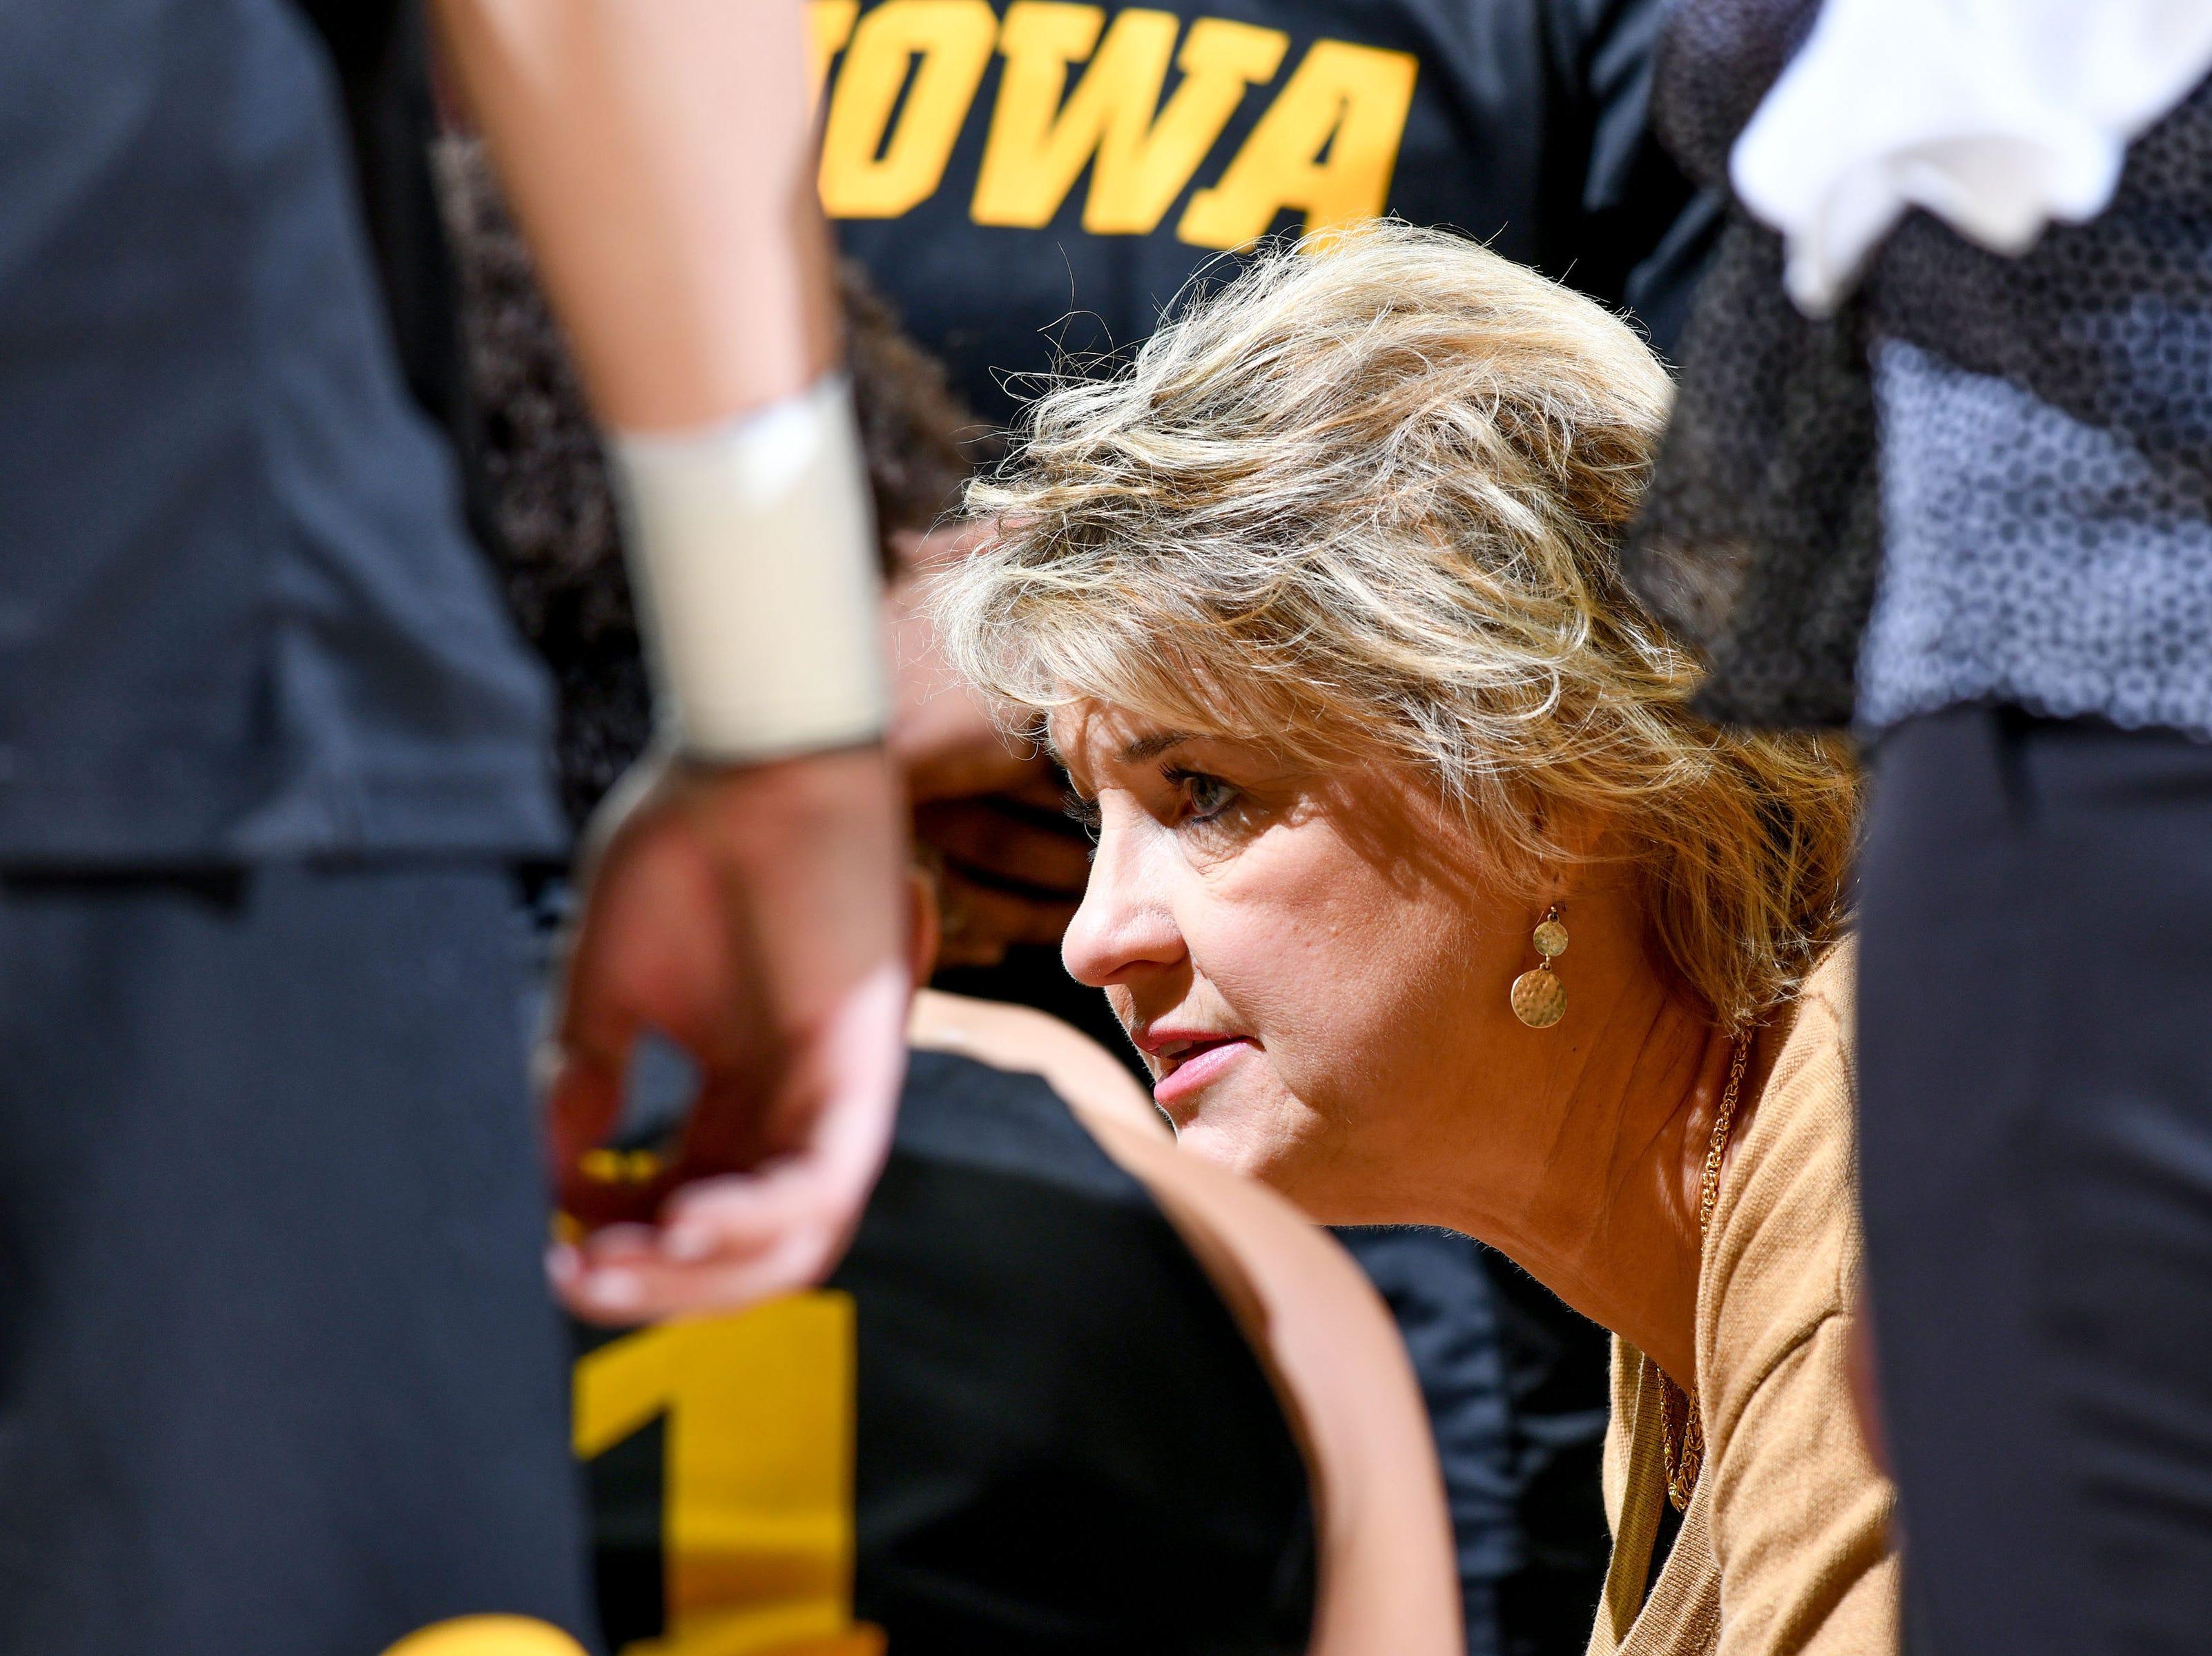 Iowa women's basketball: Second-half surge lifts No. 22 Hawkeyes to road win over Minnesota